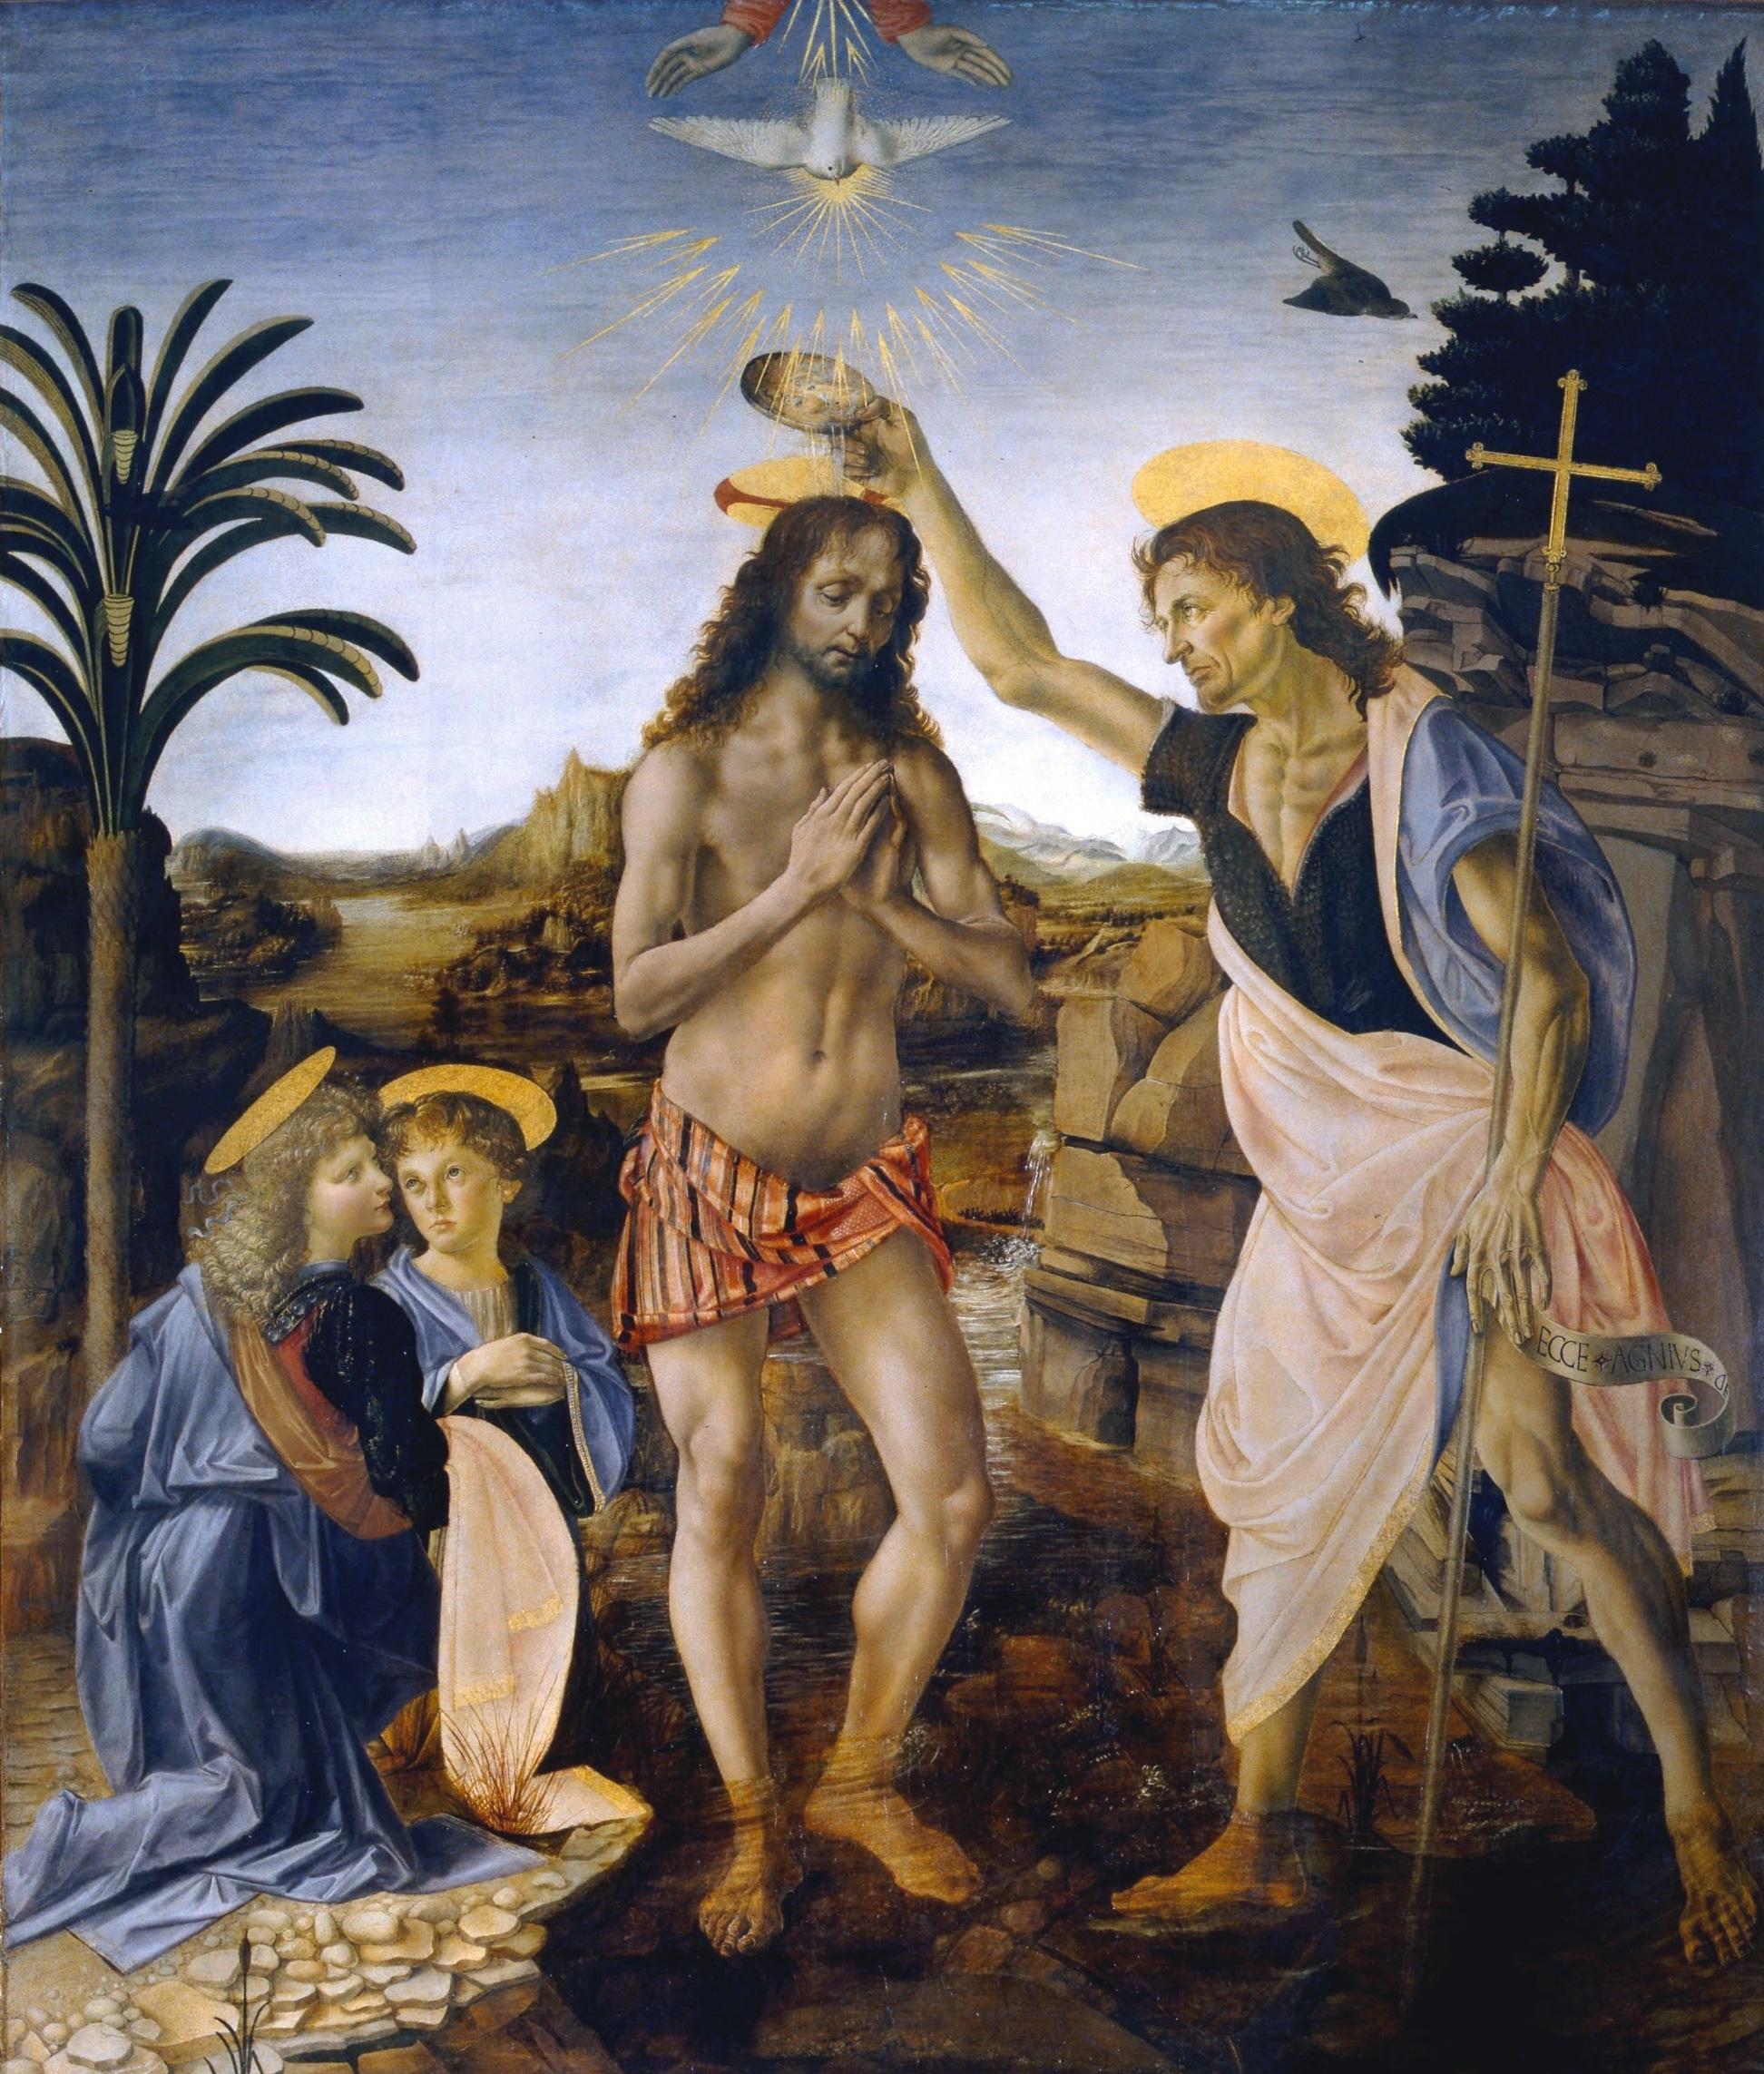 Battesimo di Cristo - Leonardo da Vinci - 1470